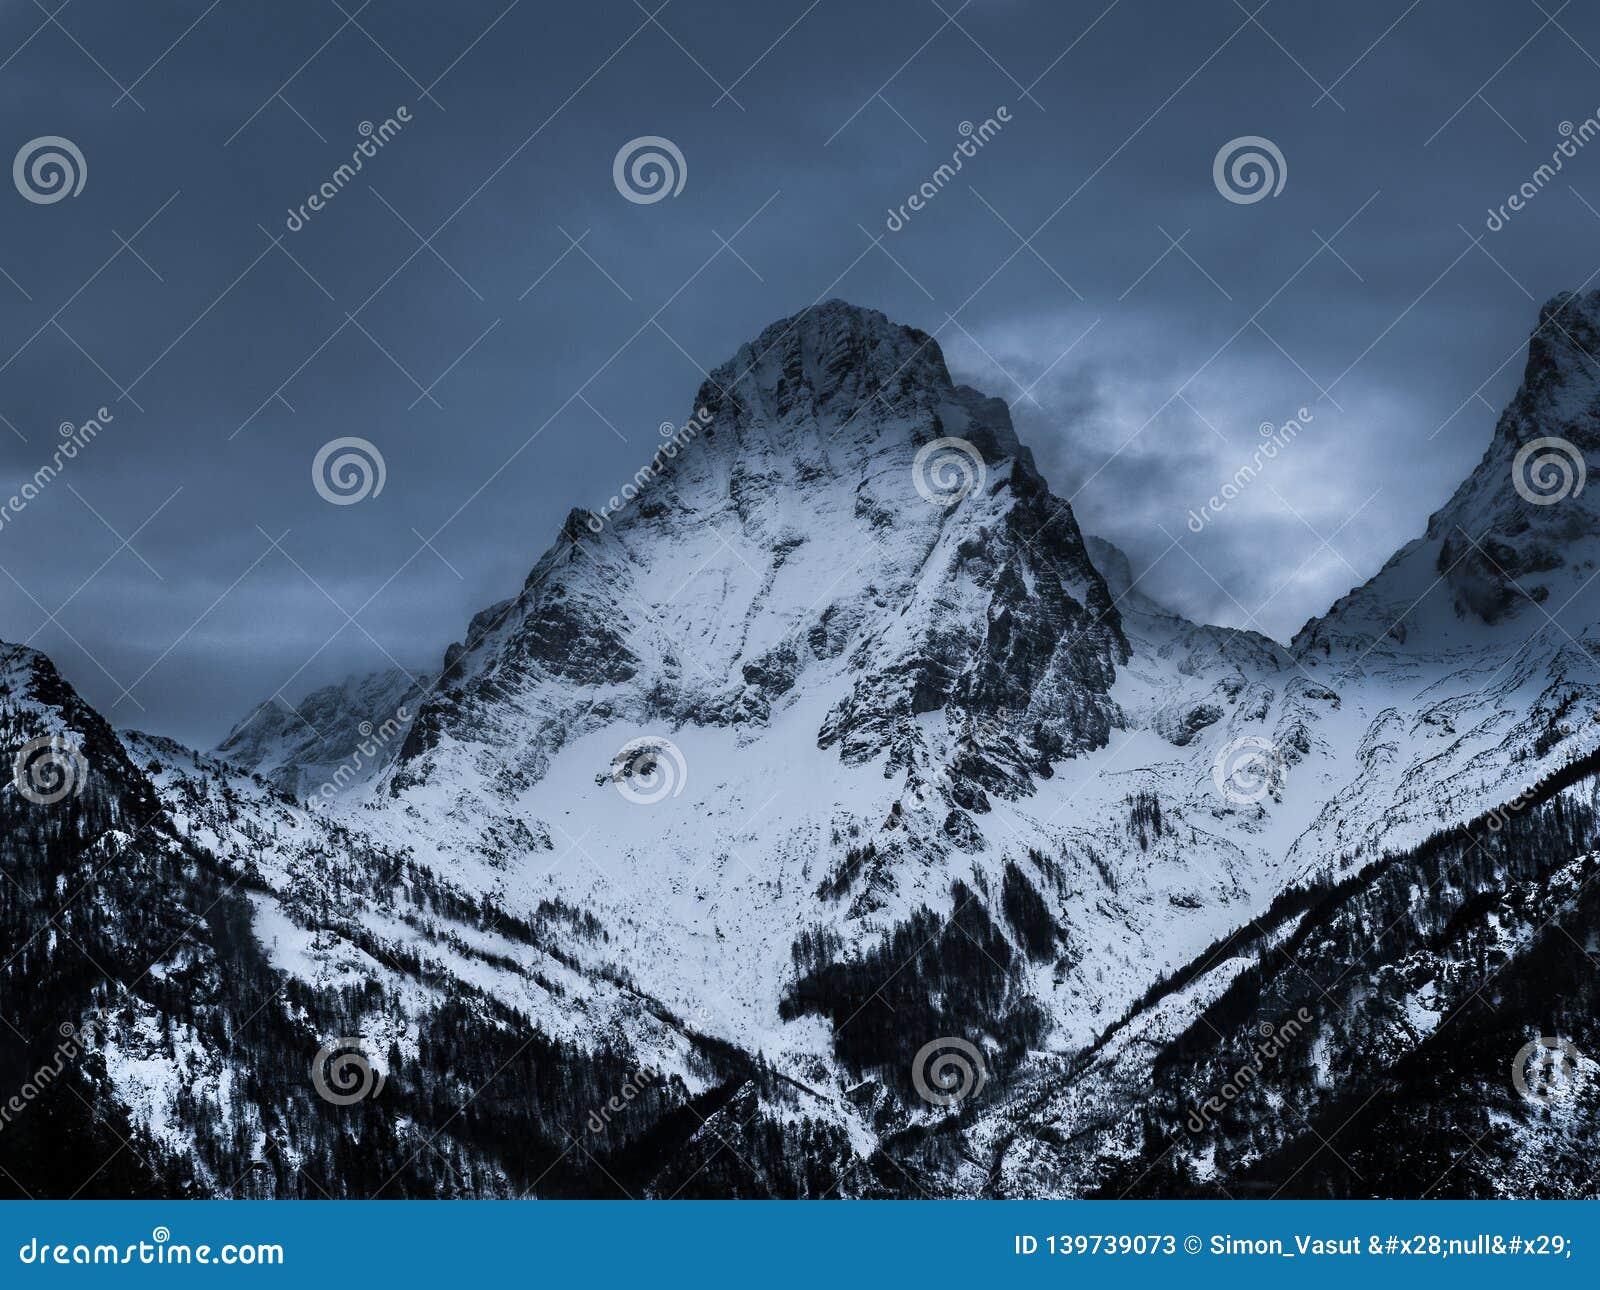 Spitzmauer 2446 m, amazing mountain in the Totes Gebirge, Alps, Austria